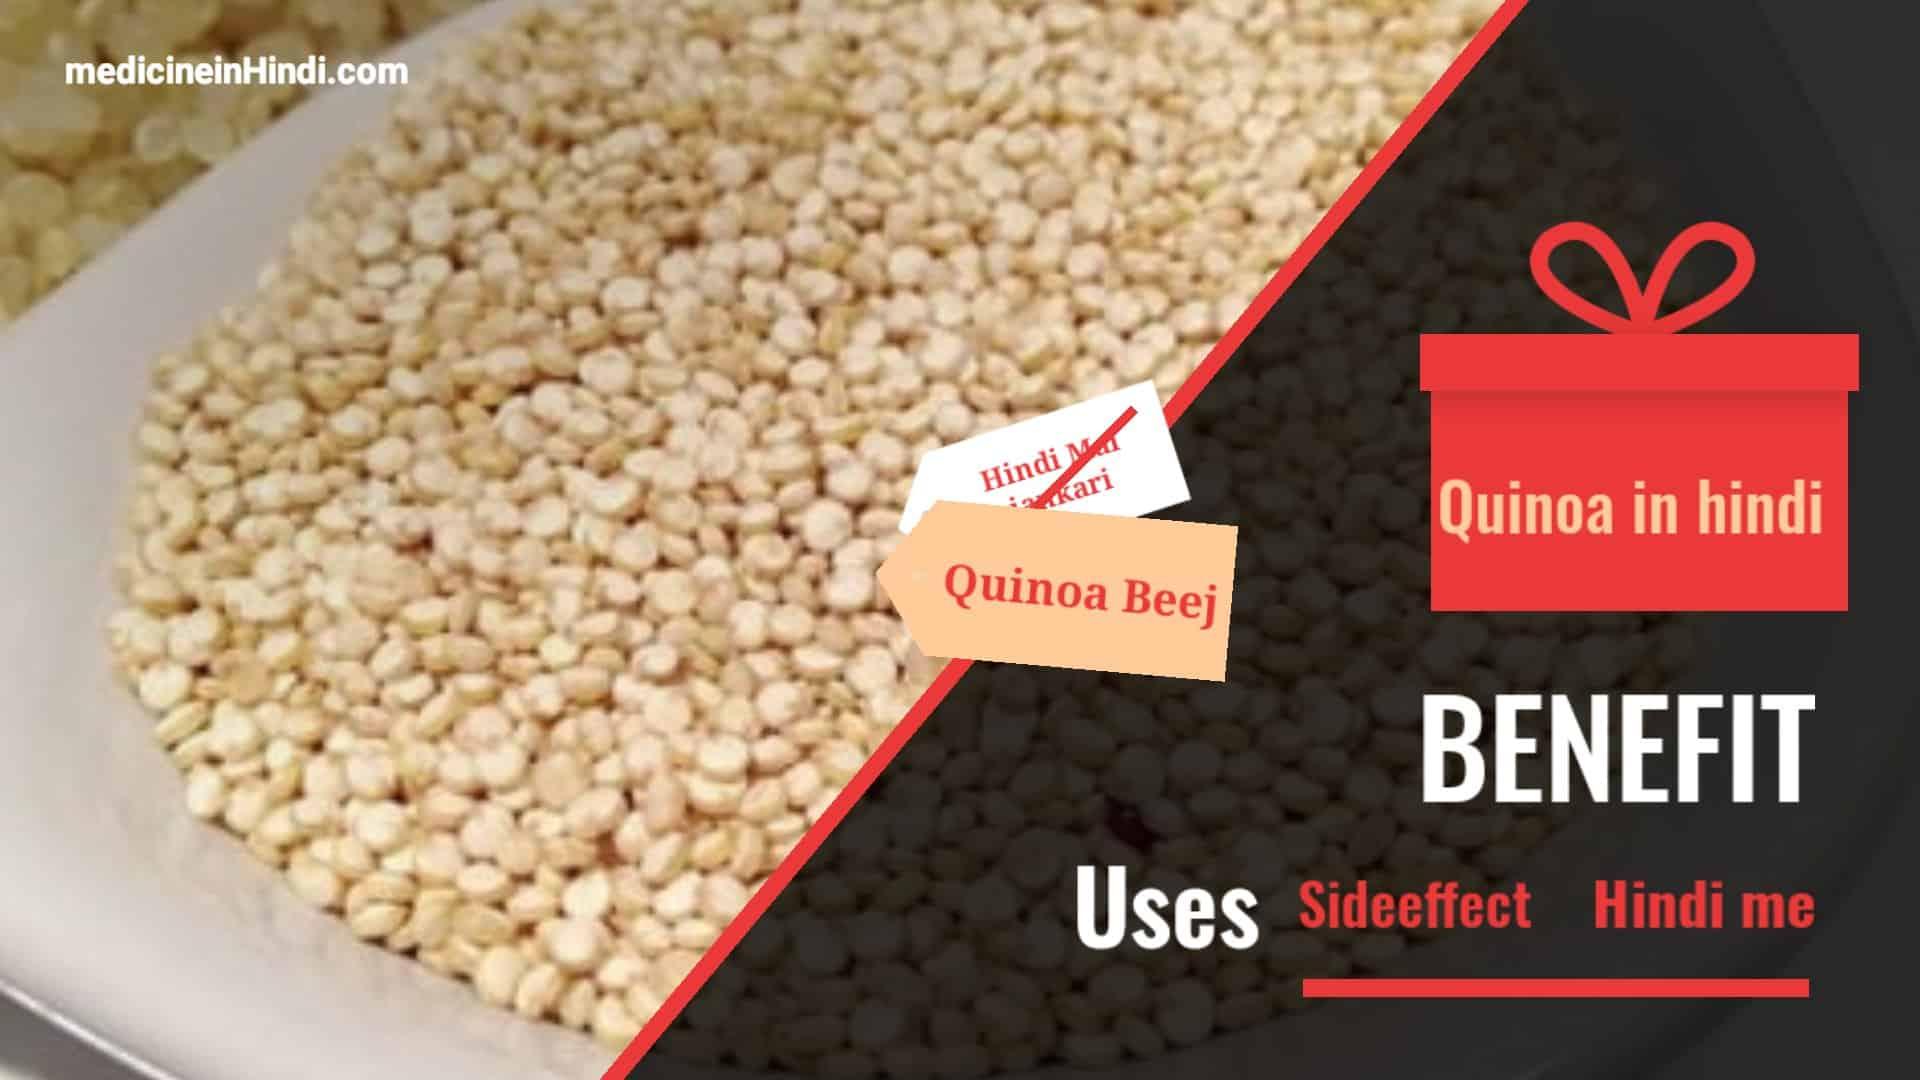 Quinoa in hindi jankari